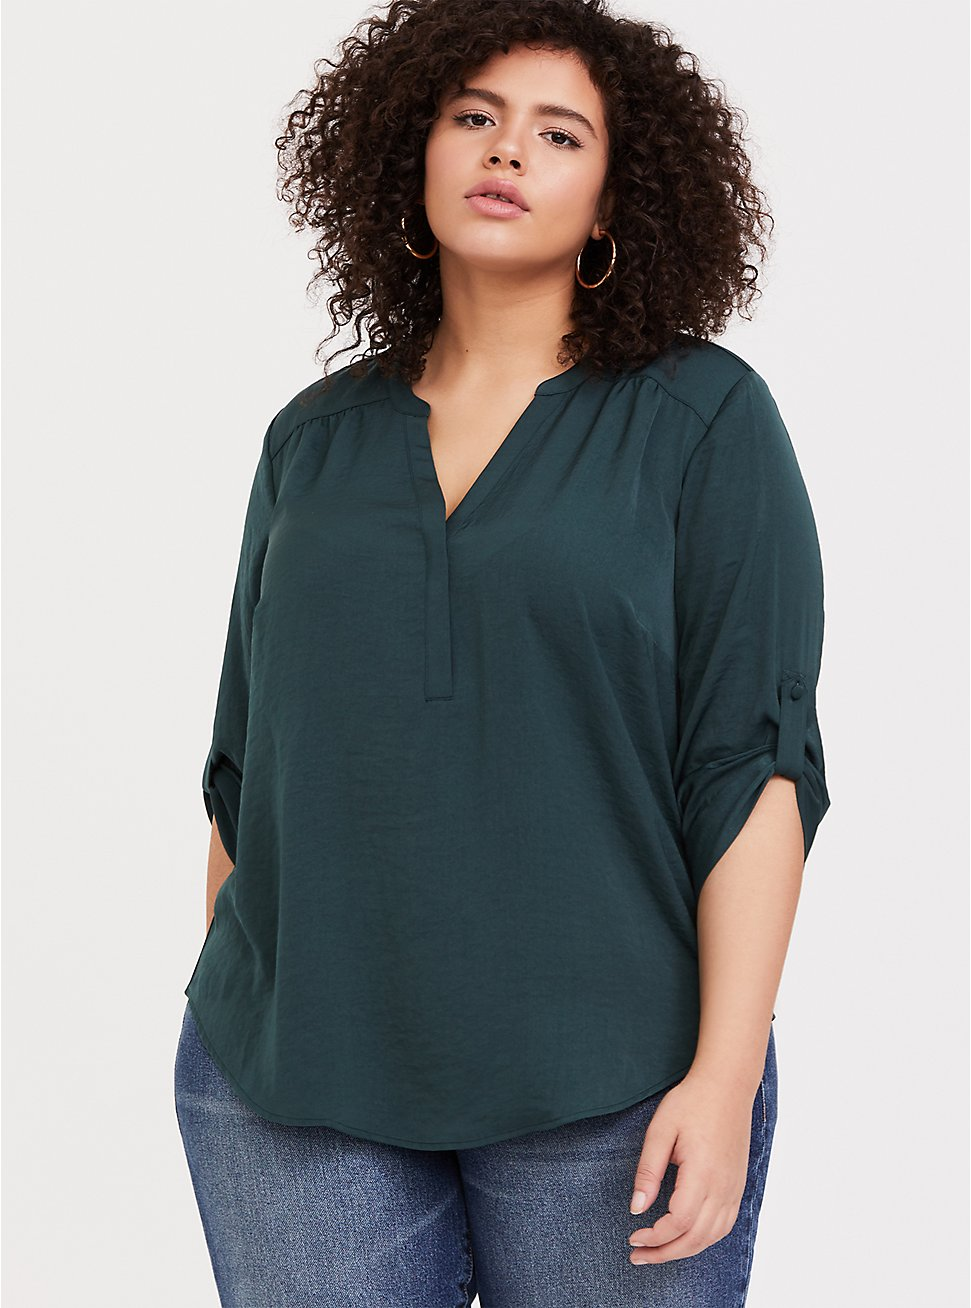 Harper - Dark Green Satin Pullover Blouse 4